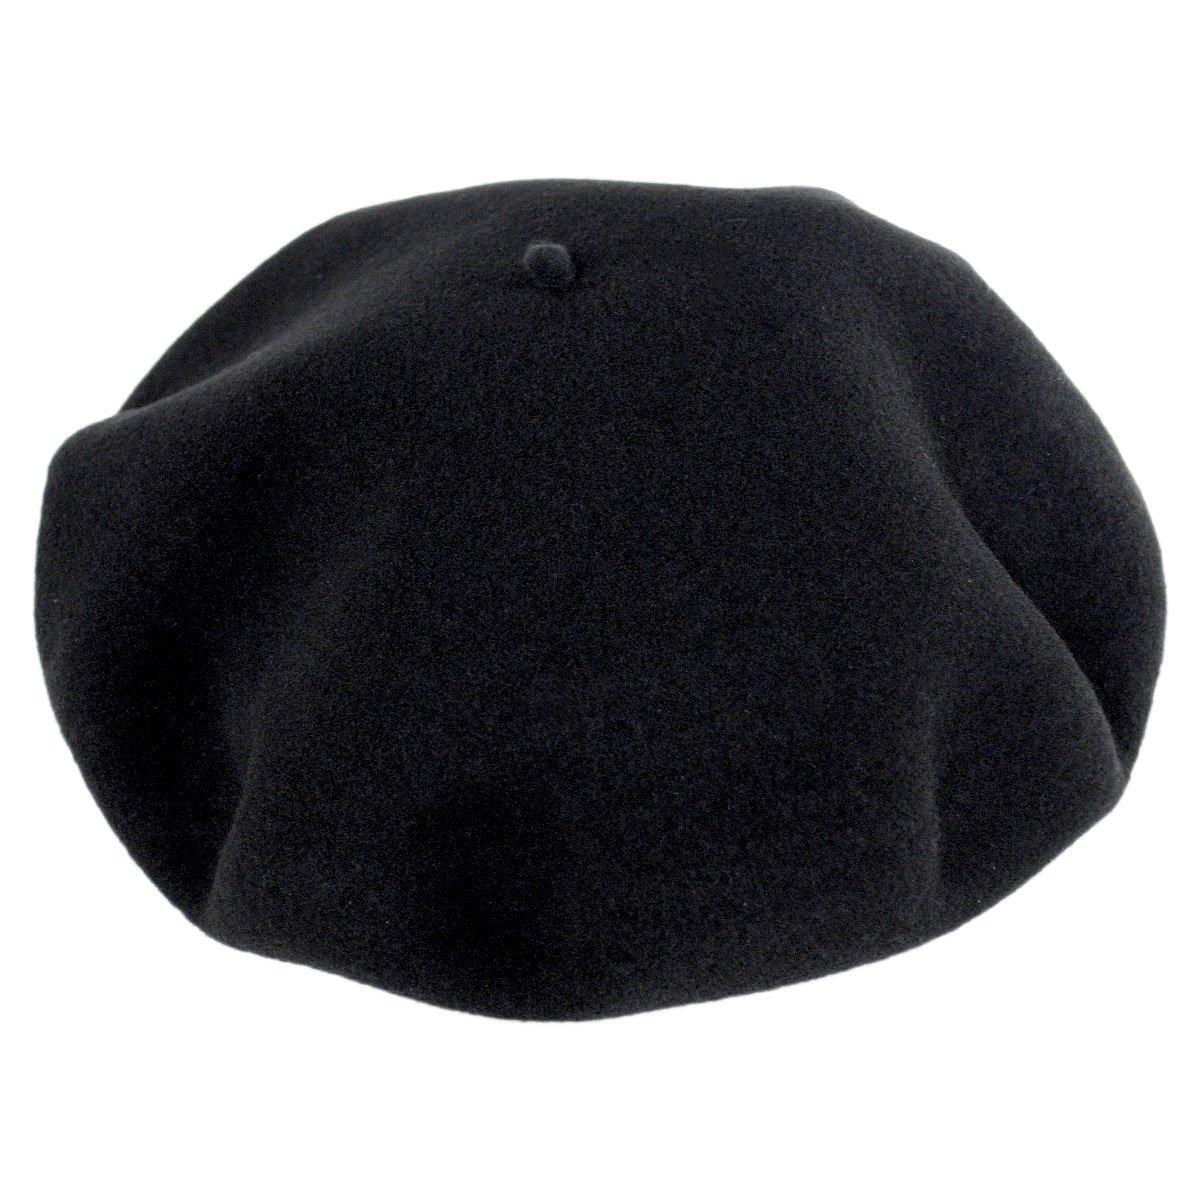 Hoquy Wool Basque Beret and Luxury Box - Black (63 cm)